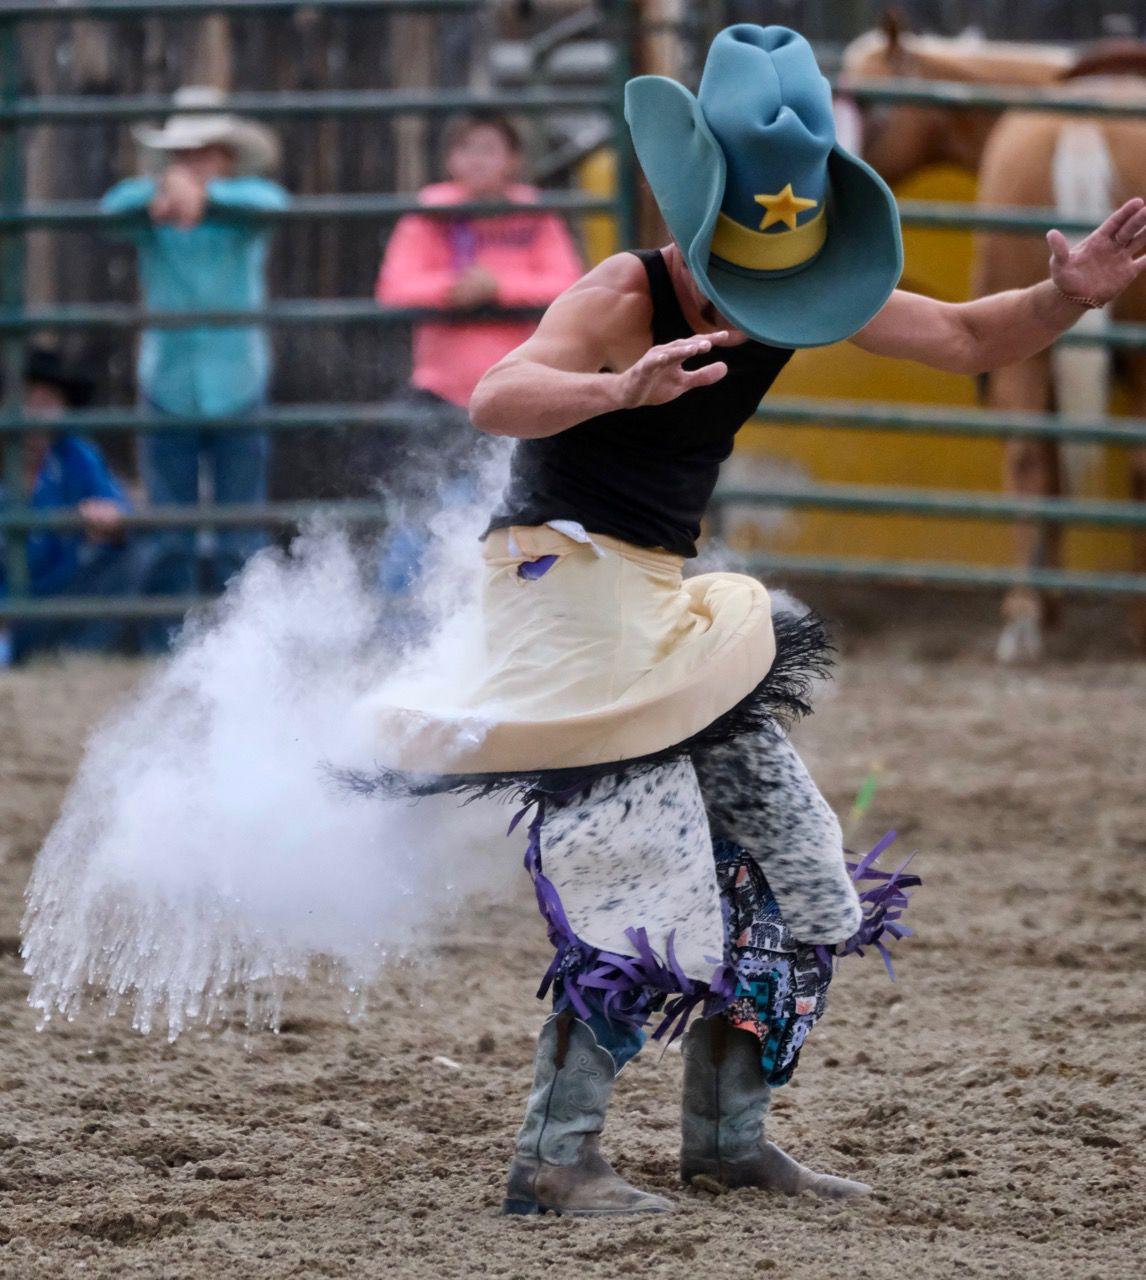 082819 Jefferson County Fair and Rodeo Eben Faler wild ride.jpg